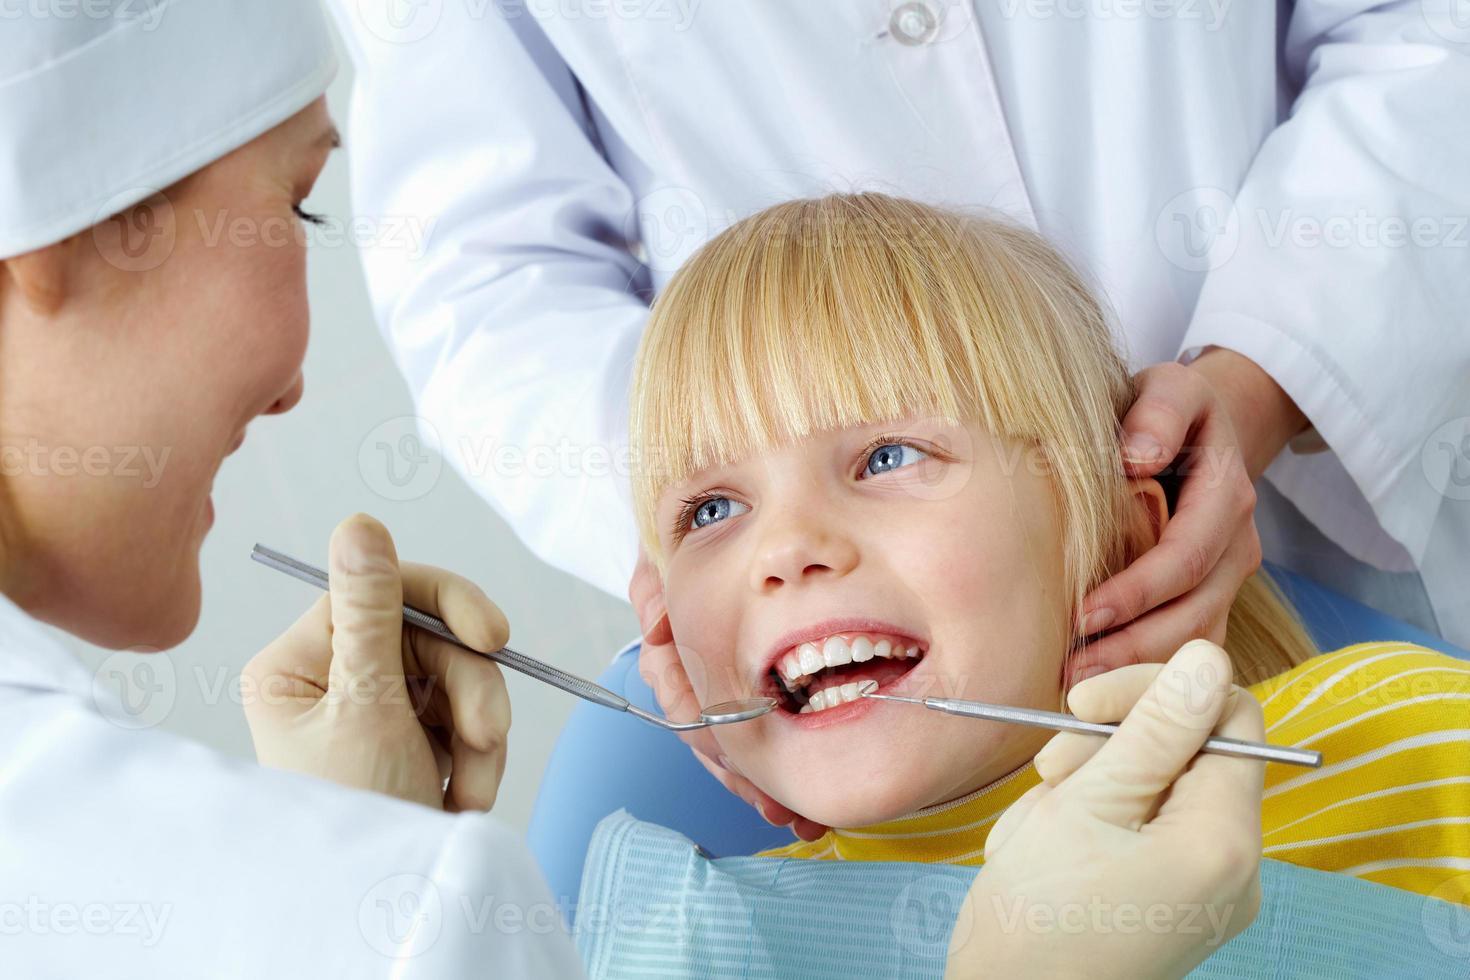 chequeo dental foto